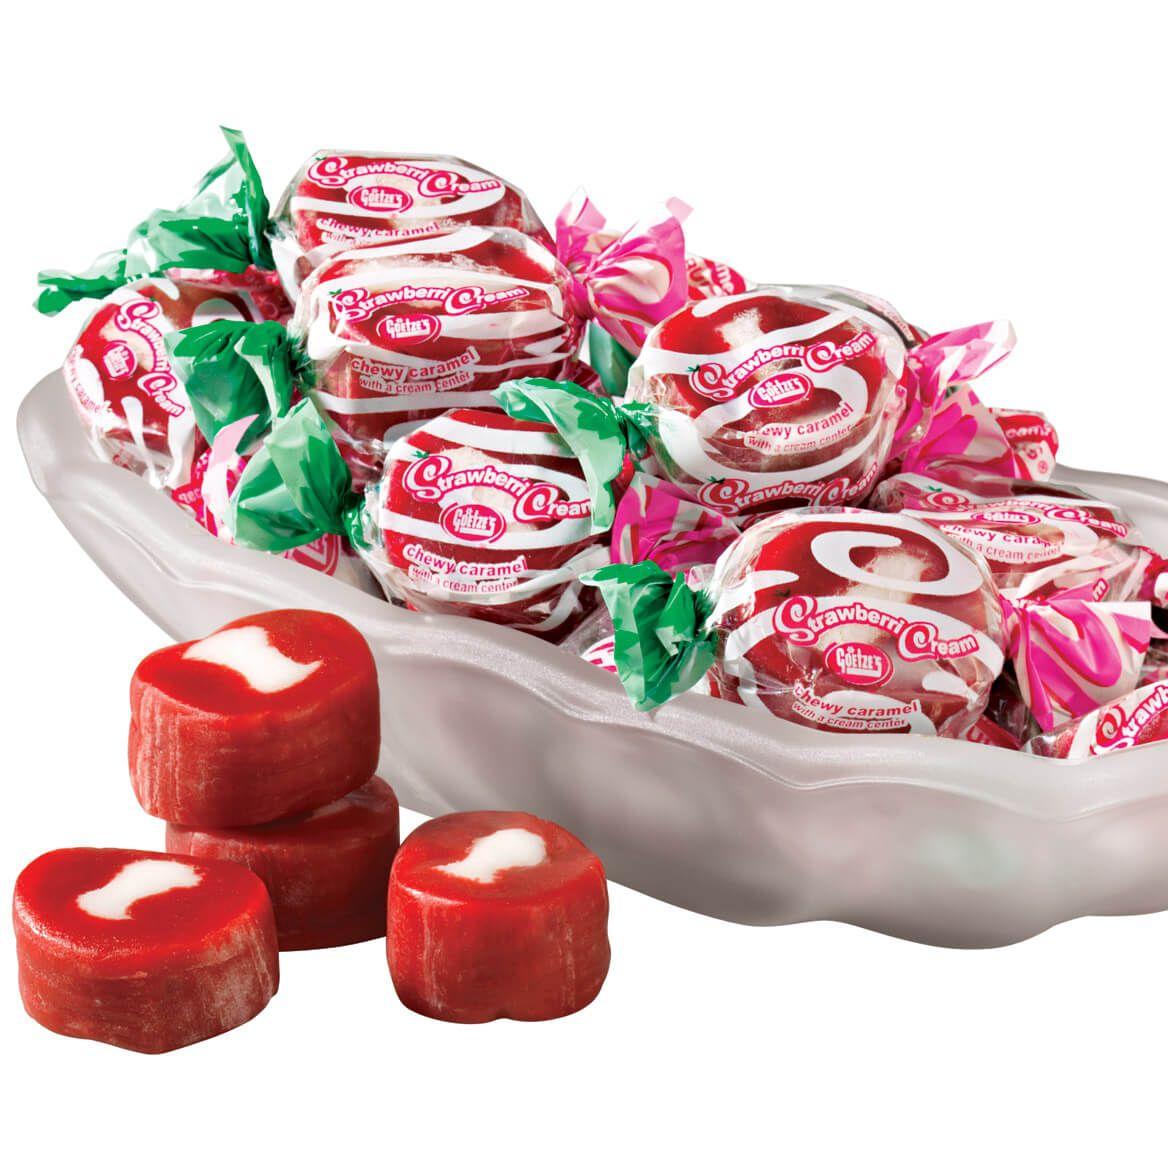 Strawberry Caramel Creams®, 11.5 oz.-343546